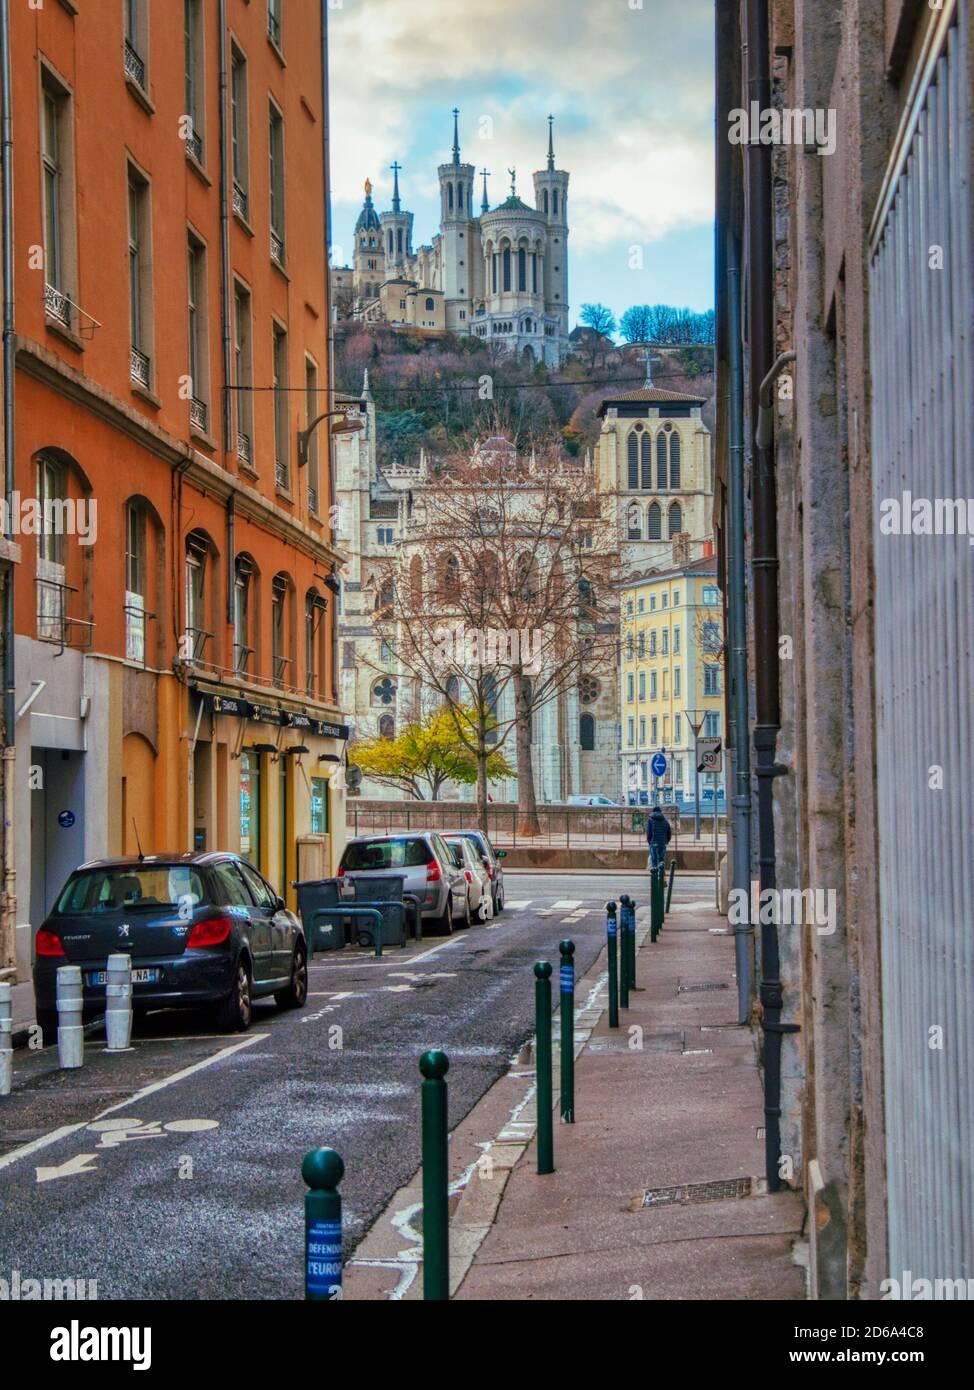 Vista a lo largo de la Rue dÕAmboise hasta la Basílica de Notre Dame de Fourviere, Lyon, Auvergne-Rh'ne-Alpes, Francia. Foto de stock